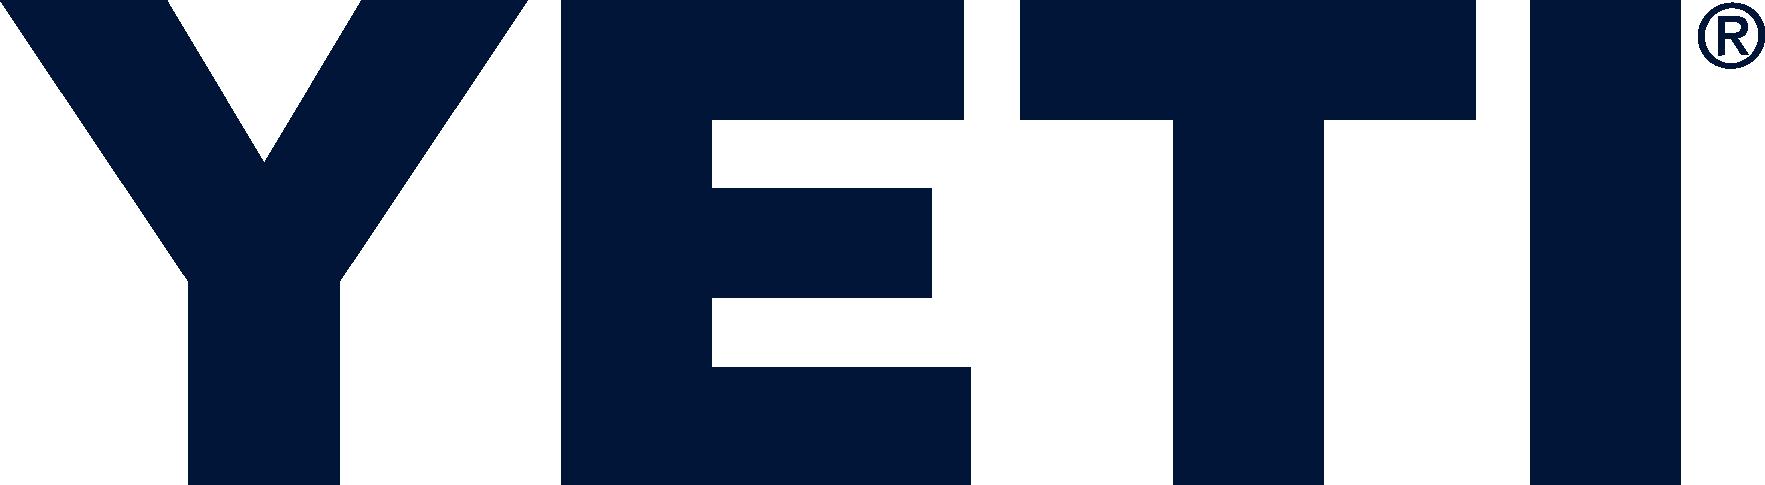 Navy-YETI-Logo-RGB-Web.png